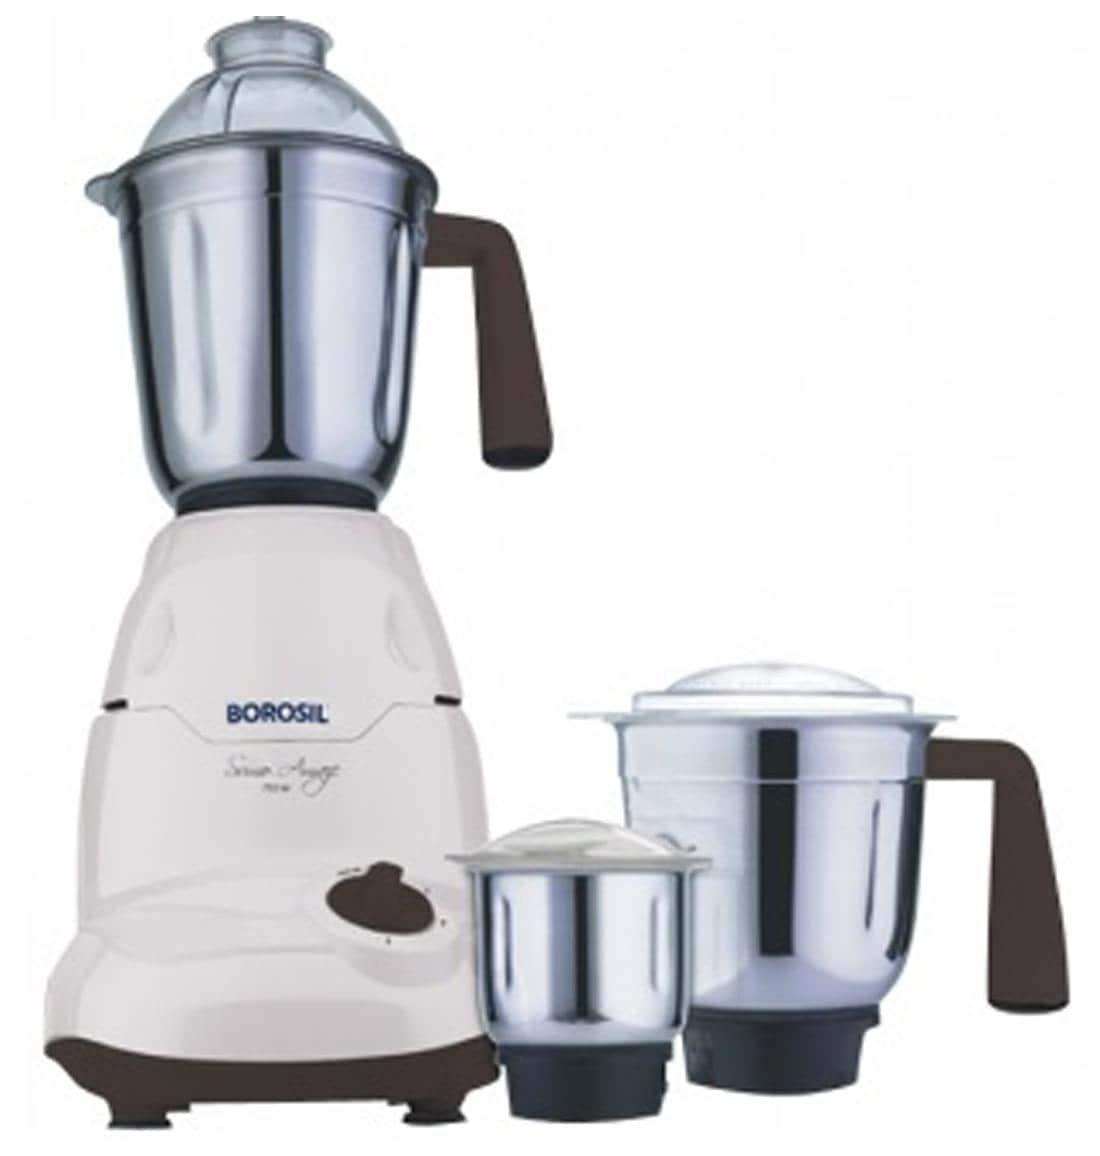 Borosil Sumo Amaze 750W Mixer Grinder (White, 3 Jar)